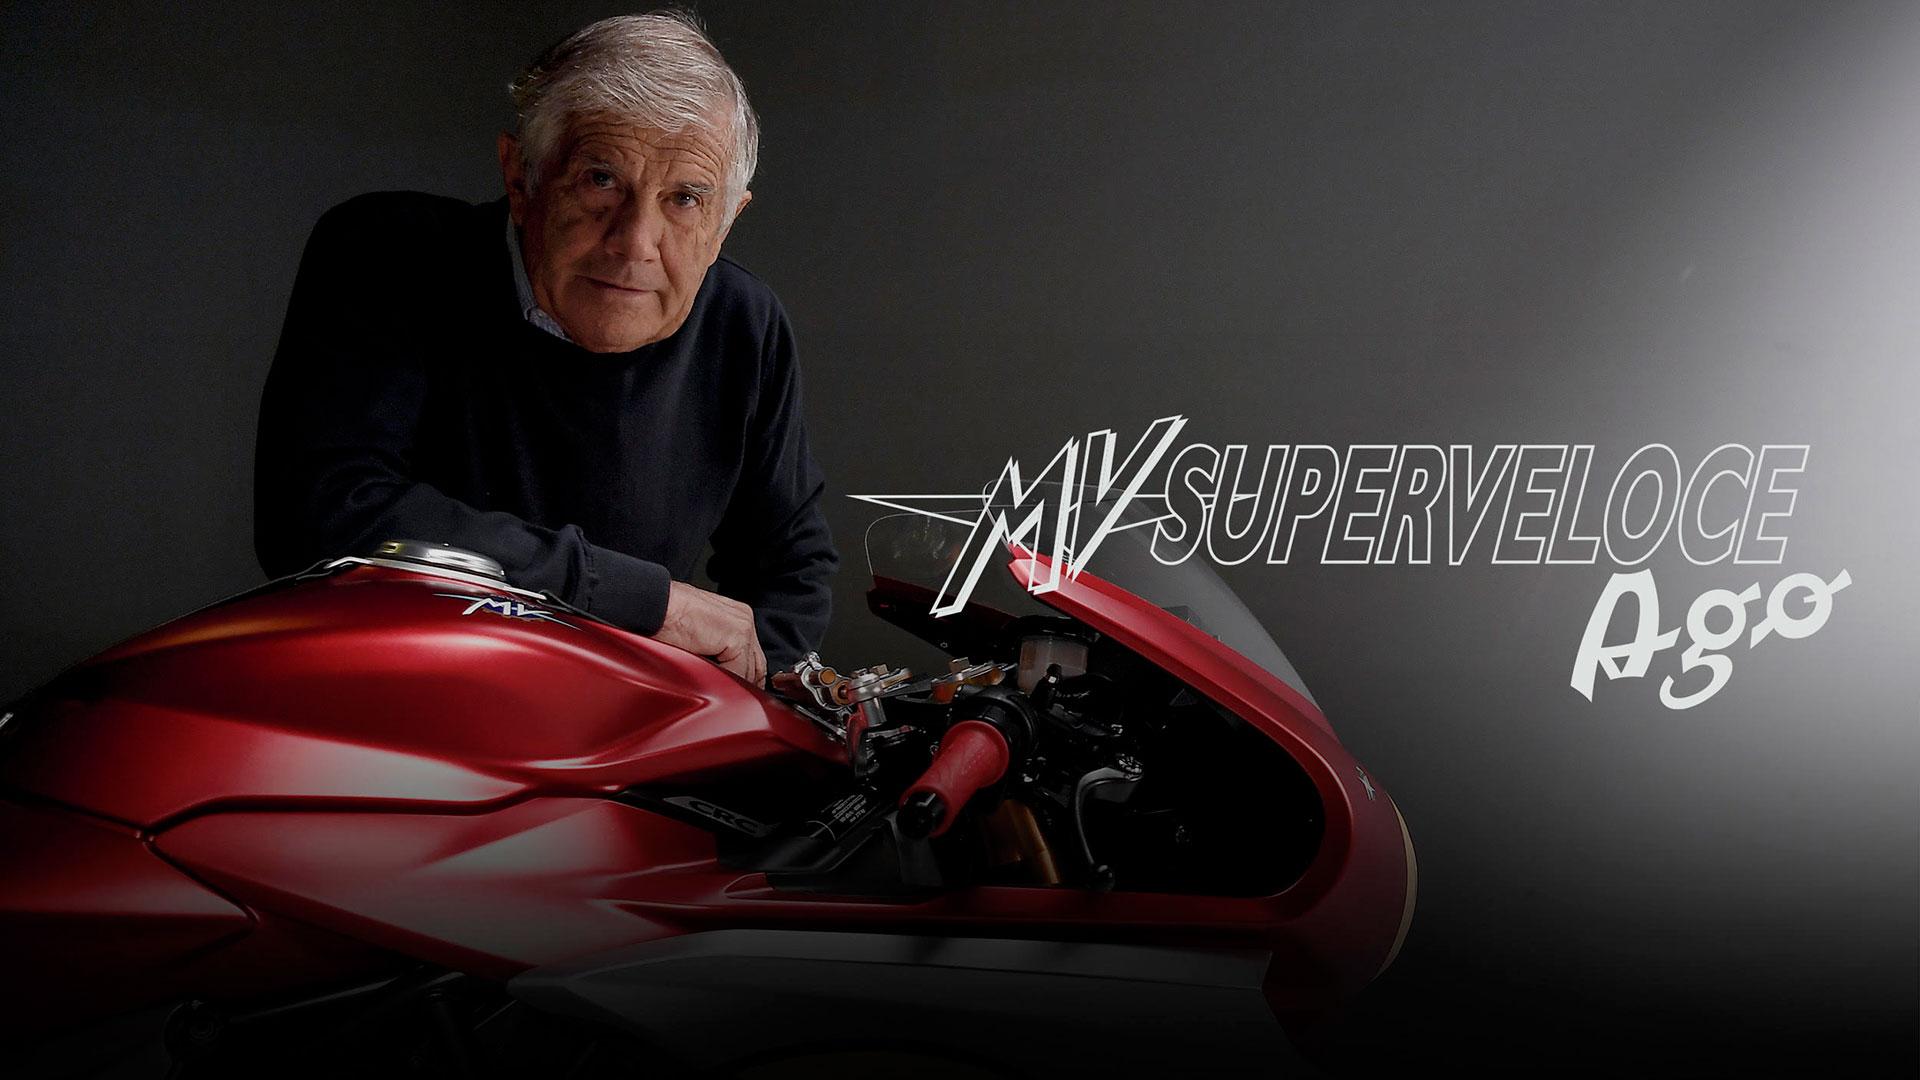 MV Agusta Superveloce AGO: presentación inminente en el GP de Emilia Romaña